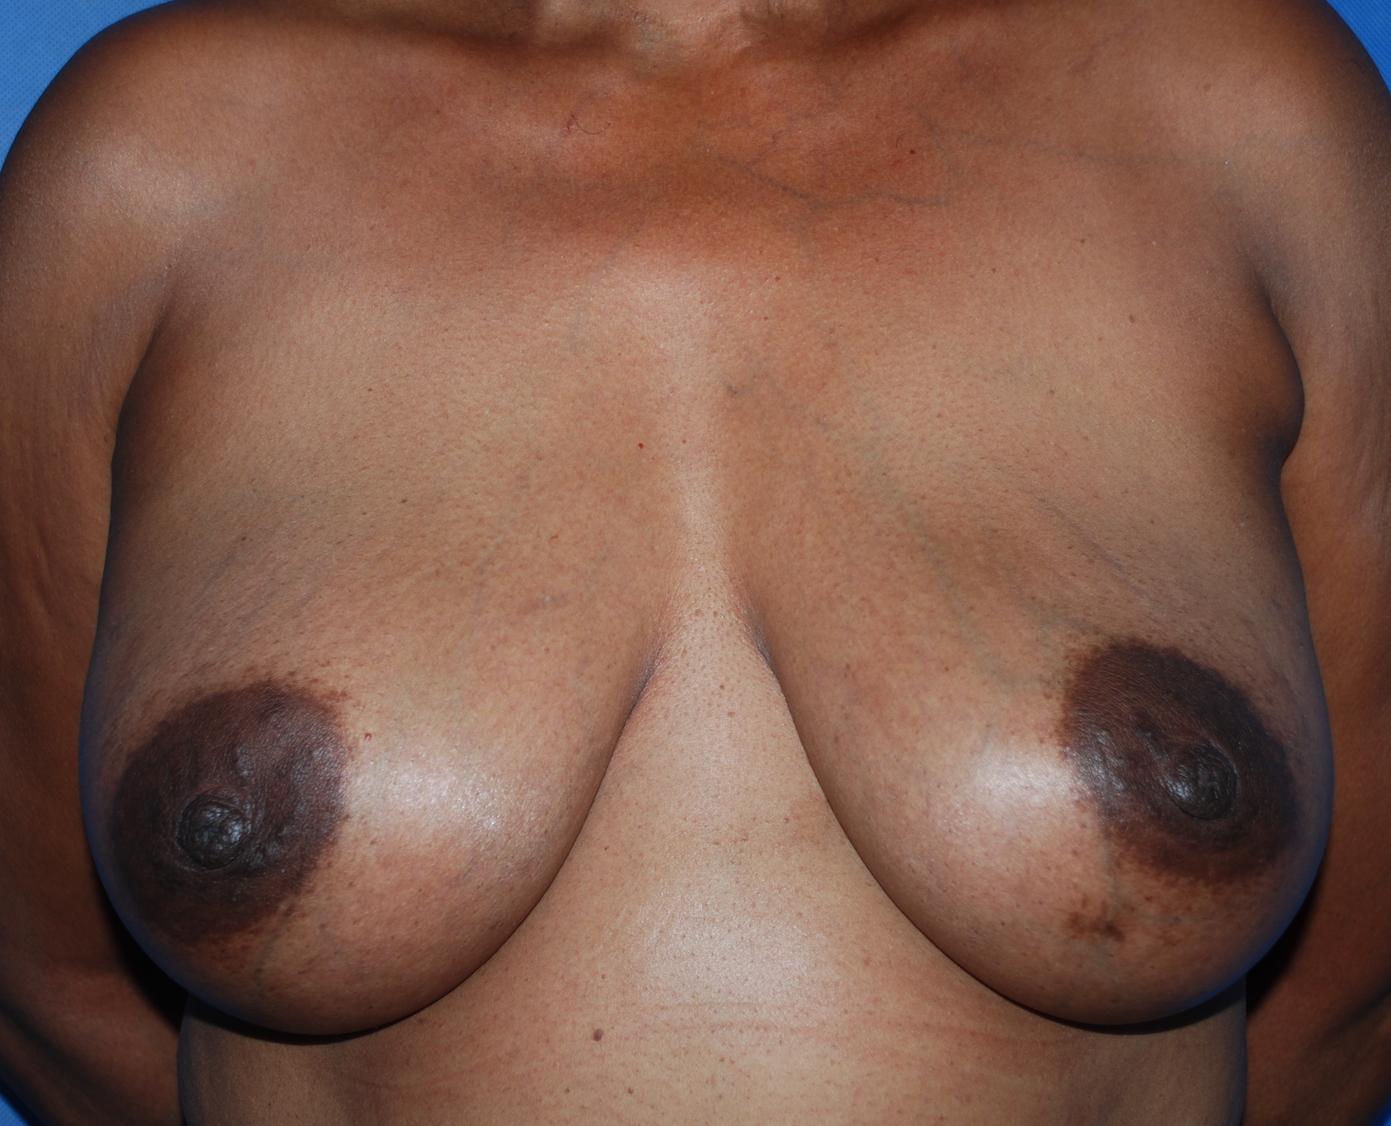 breast capsule treatment